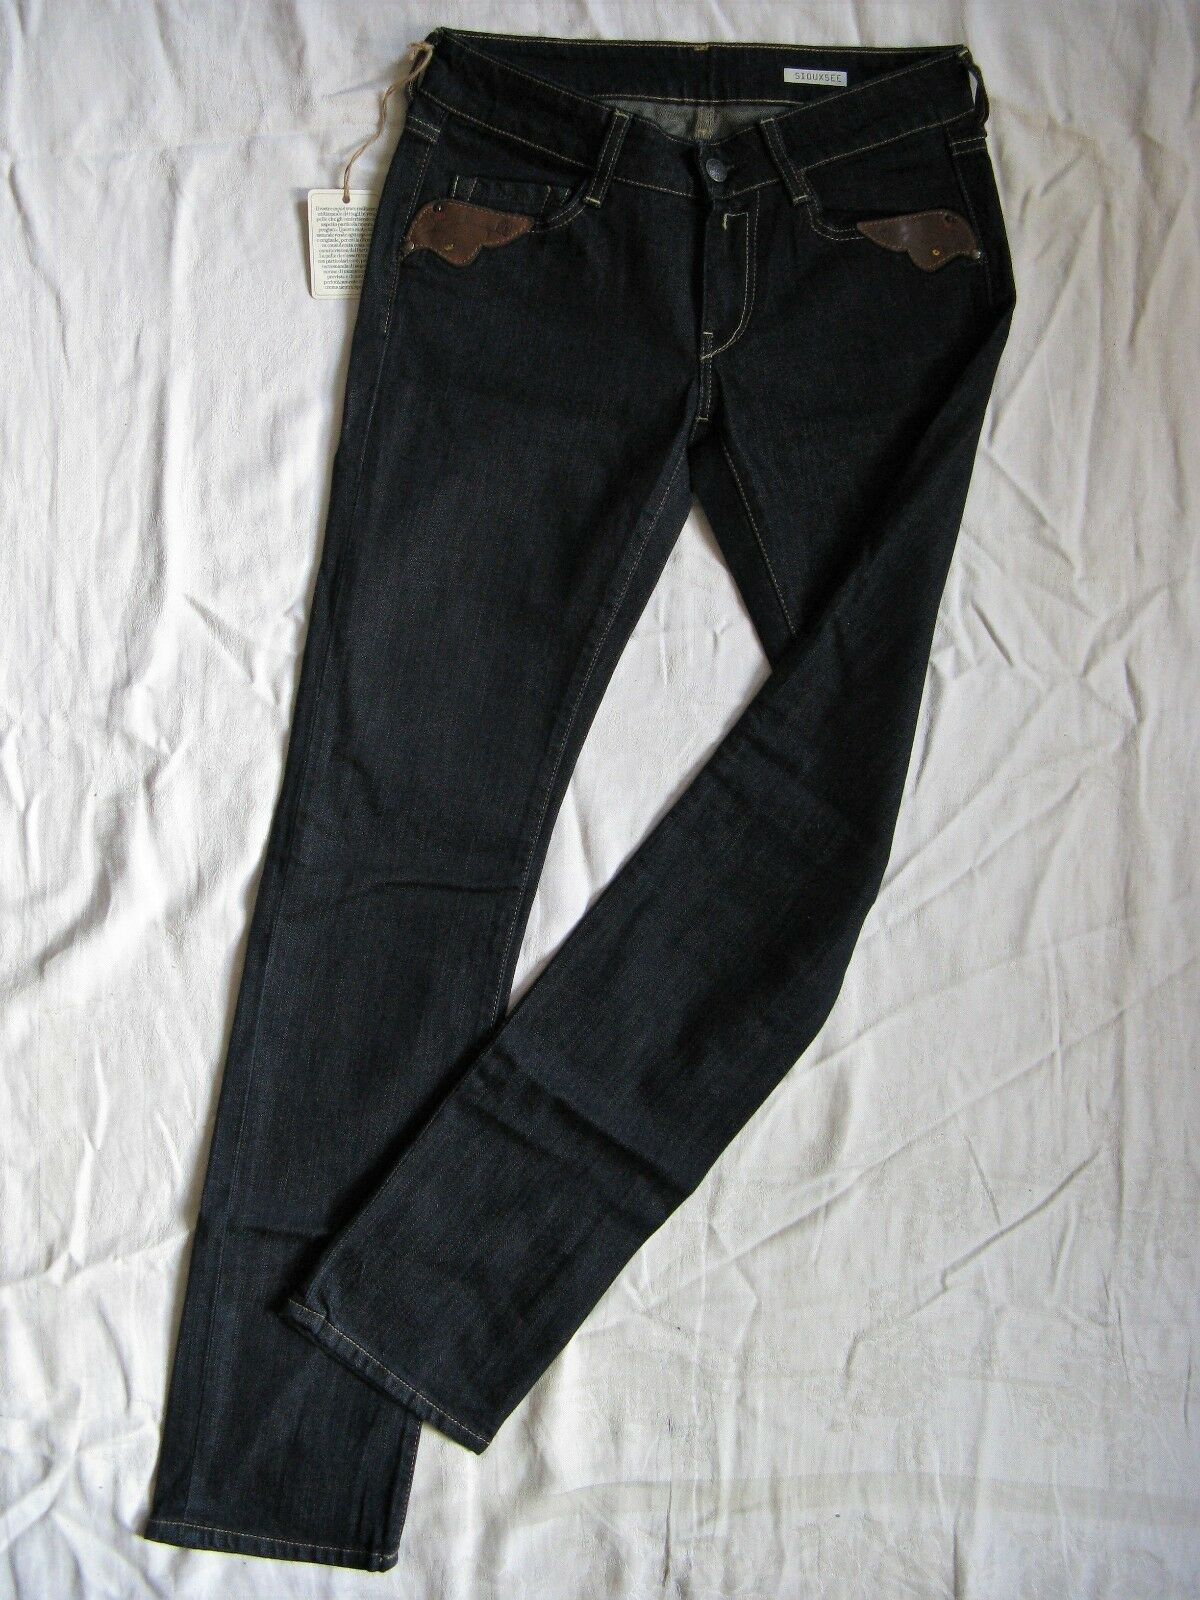 REPLAY siouxsee Donna blu Jeans Stretch w26 l32 Low Waist Slim Fit Straight Leg